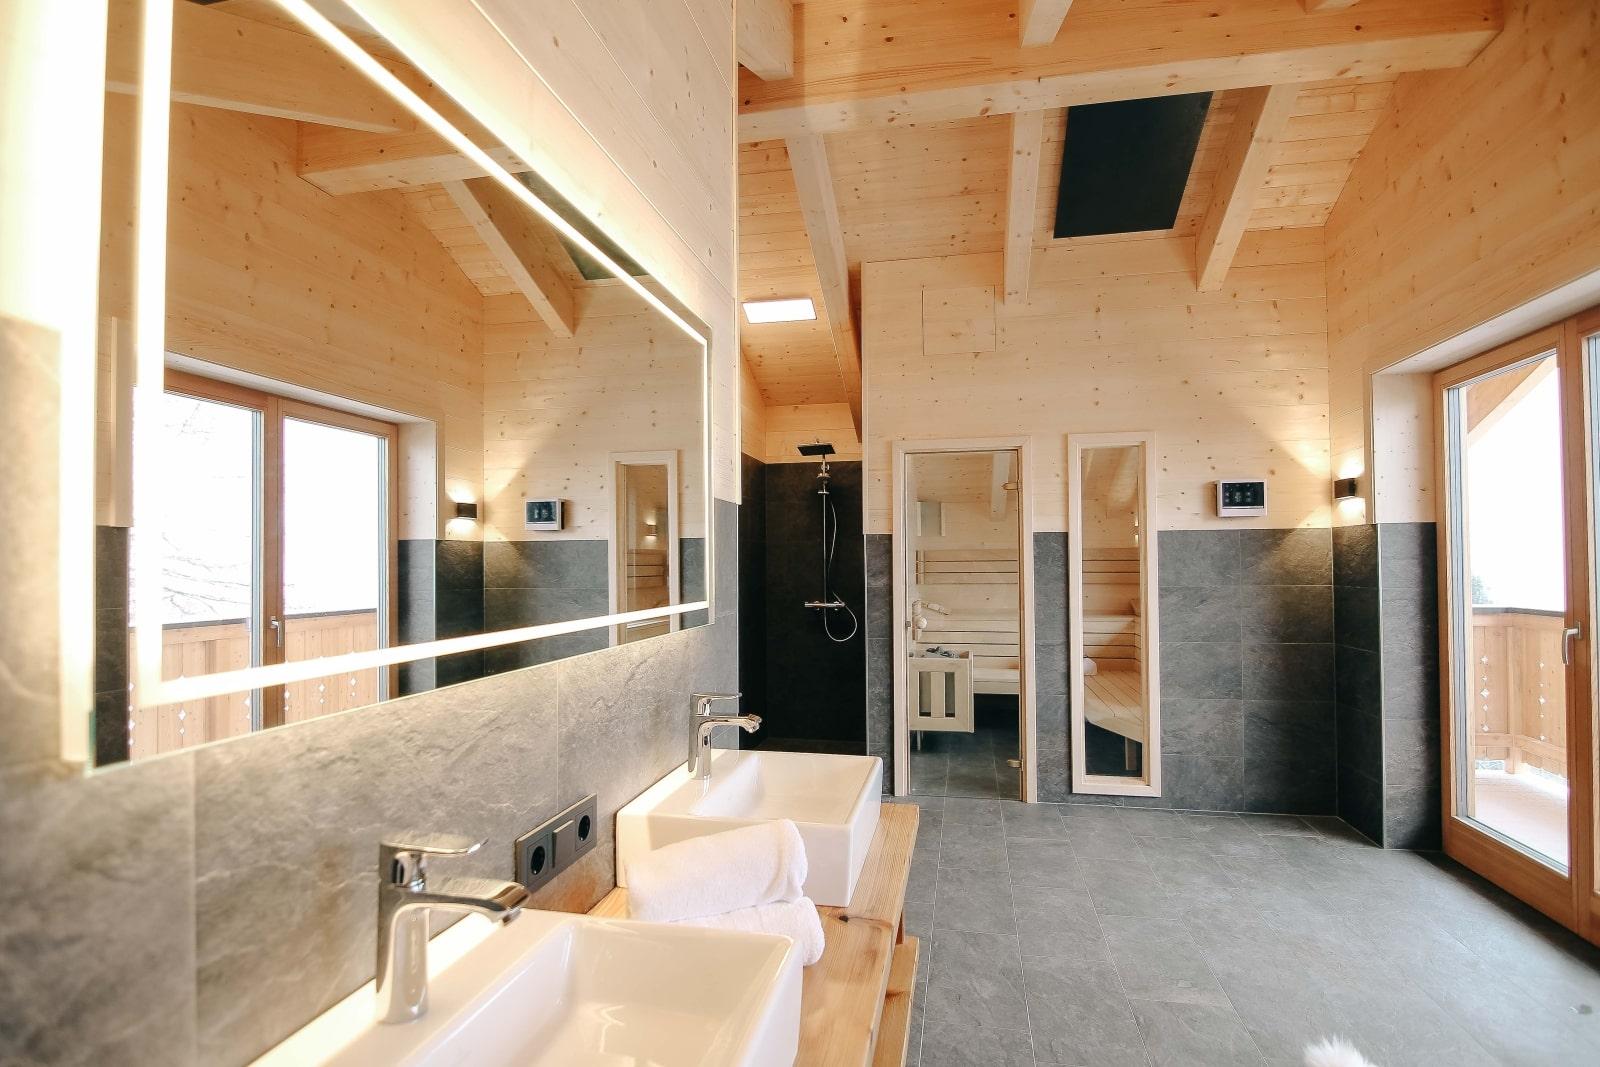 Heidi-Chalet-Falkert-Heidialm-Almsommer-Wellness-Bad-Sauna-Luxus